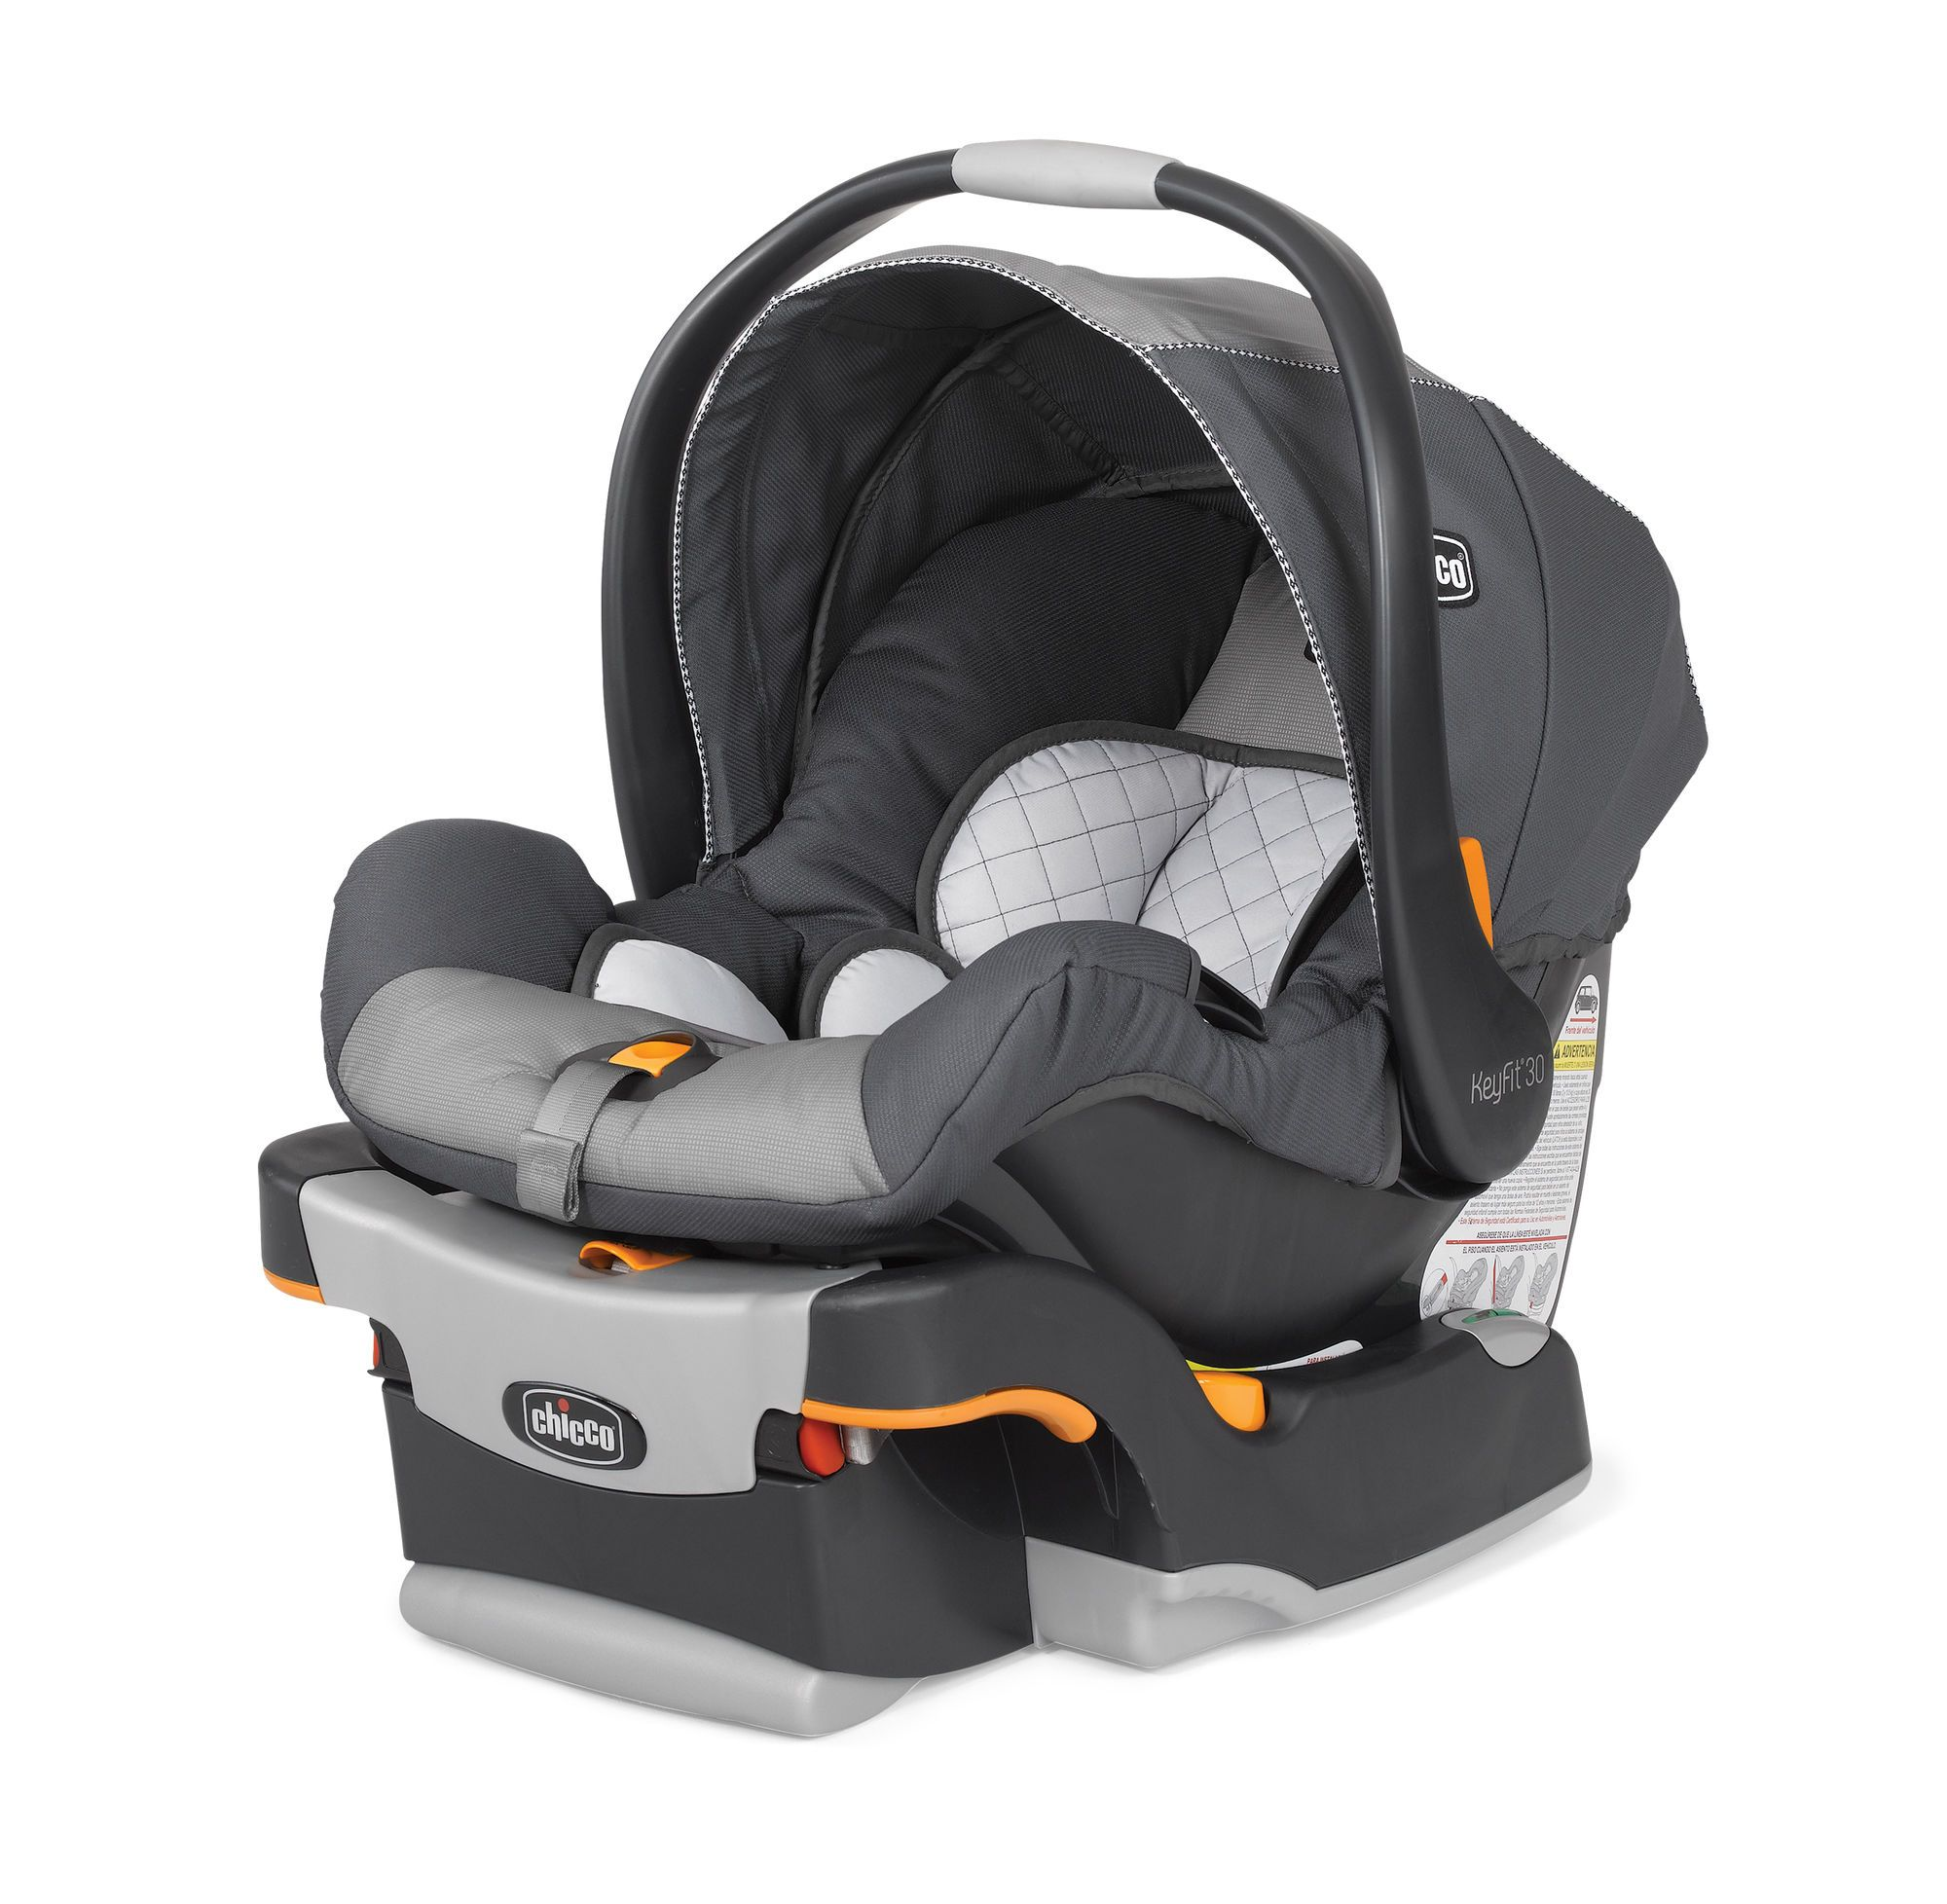 KeyFit 30 Infant Car Seat Moonstone in Moonstone Baby